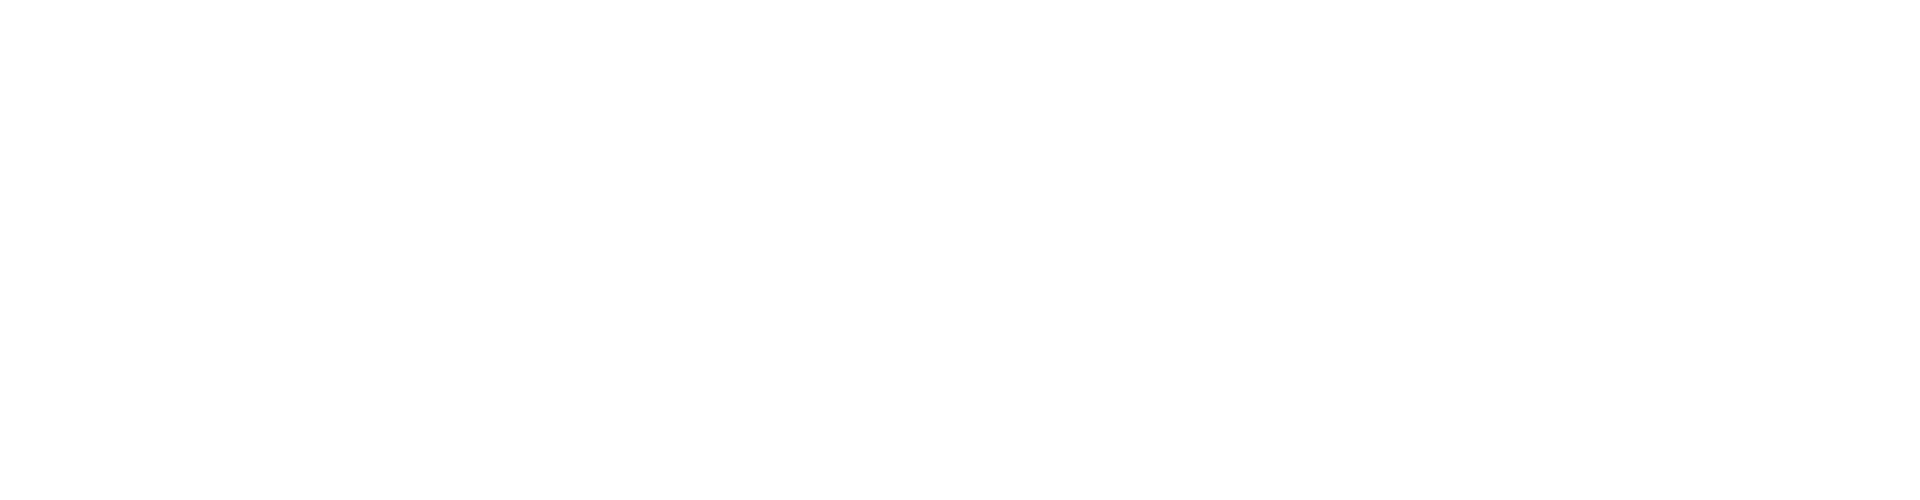 catalog/Sliders/novos/capacitacao-banner-3.png